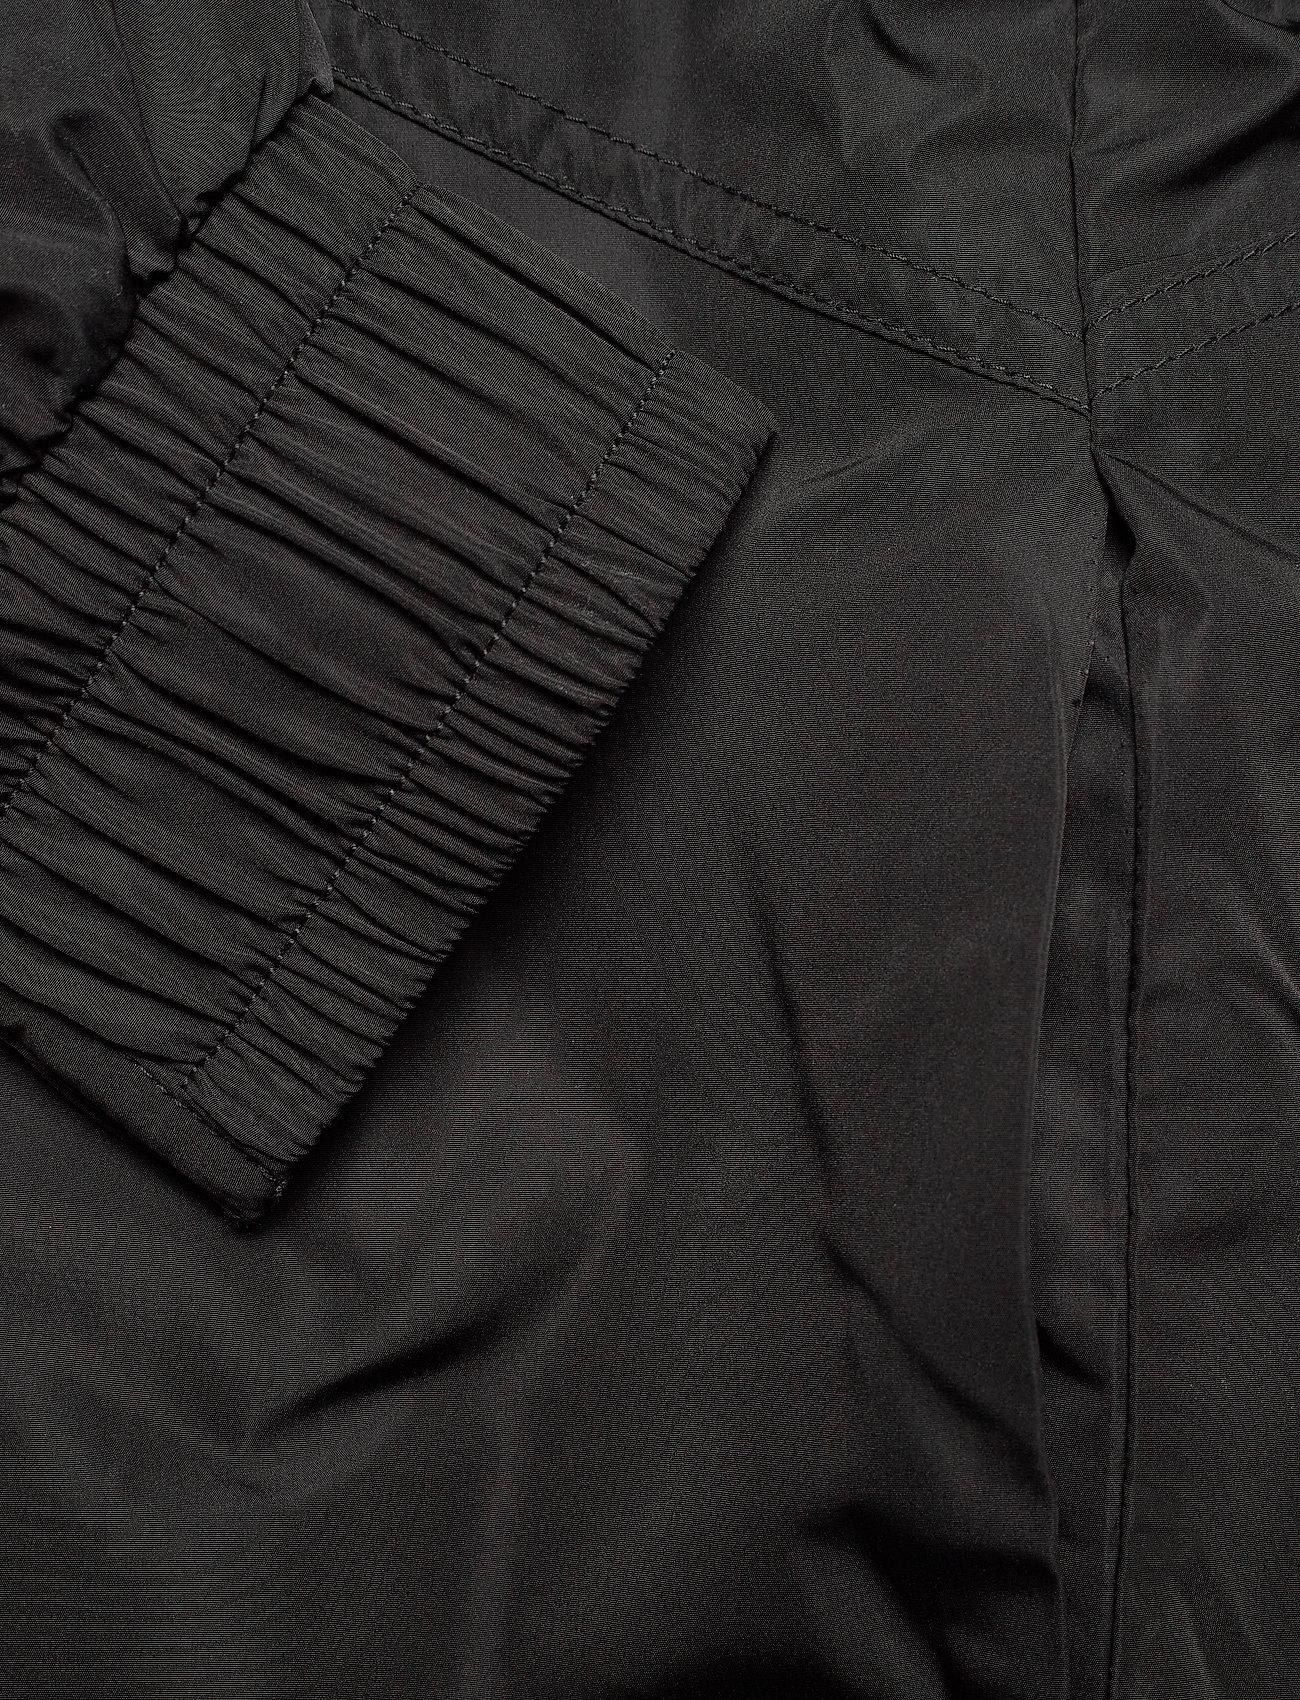 Metallic Windbreaker (Ck Black) (1800 kr) - Calvin Klein Jeans